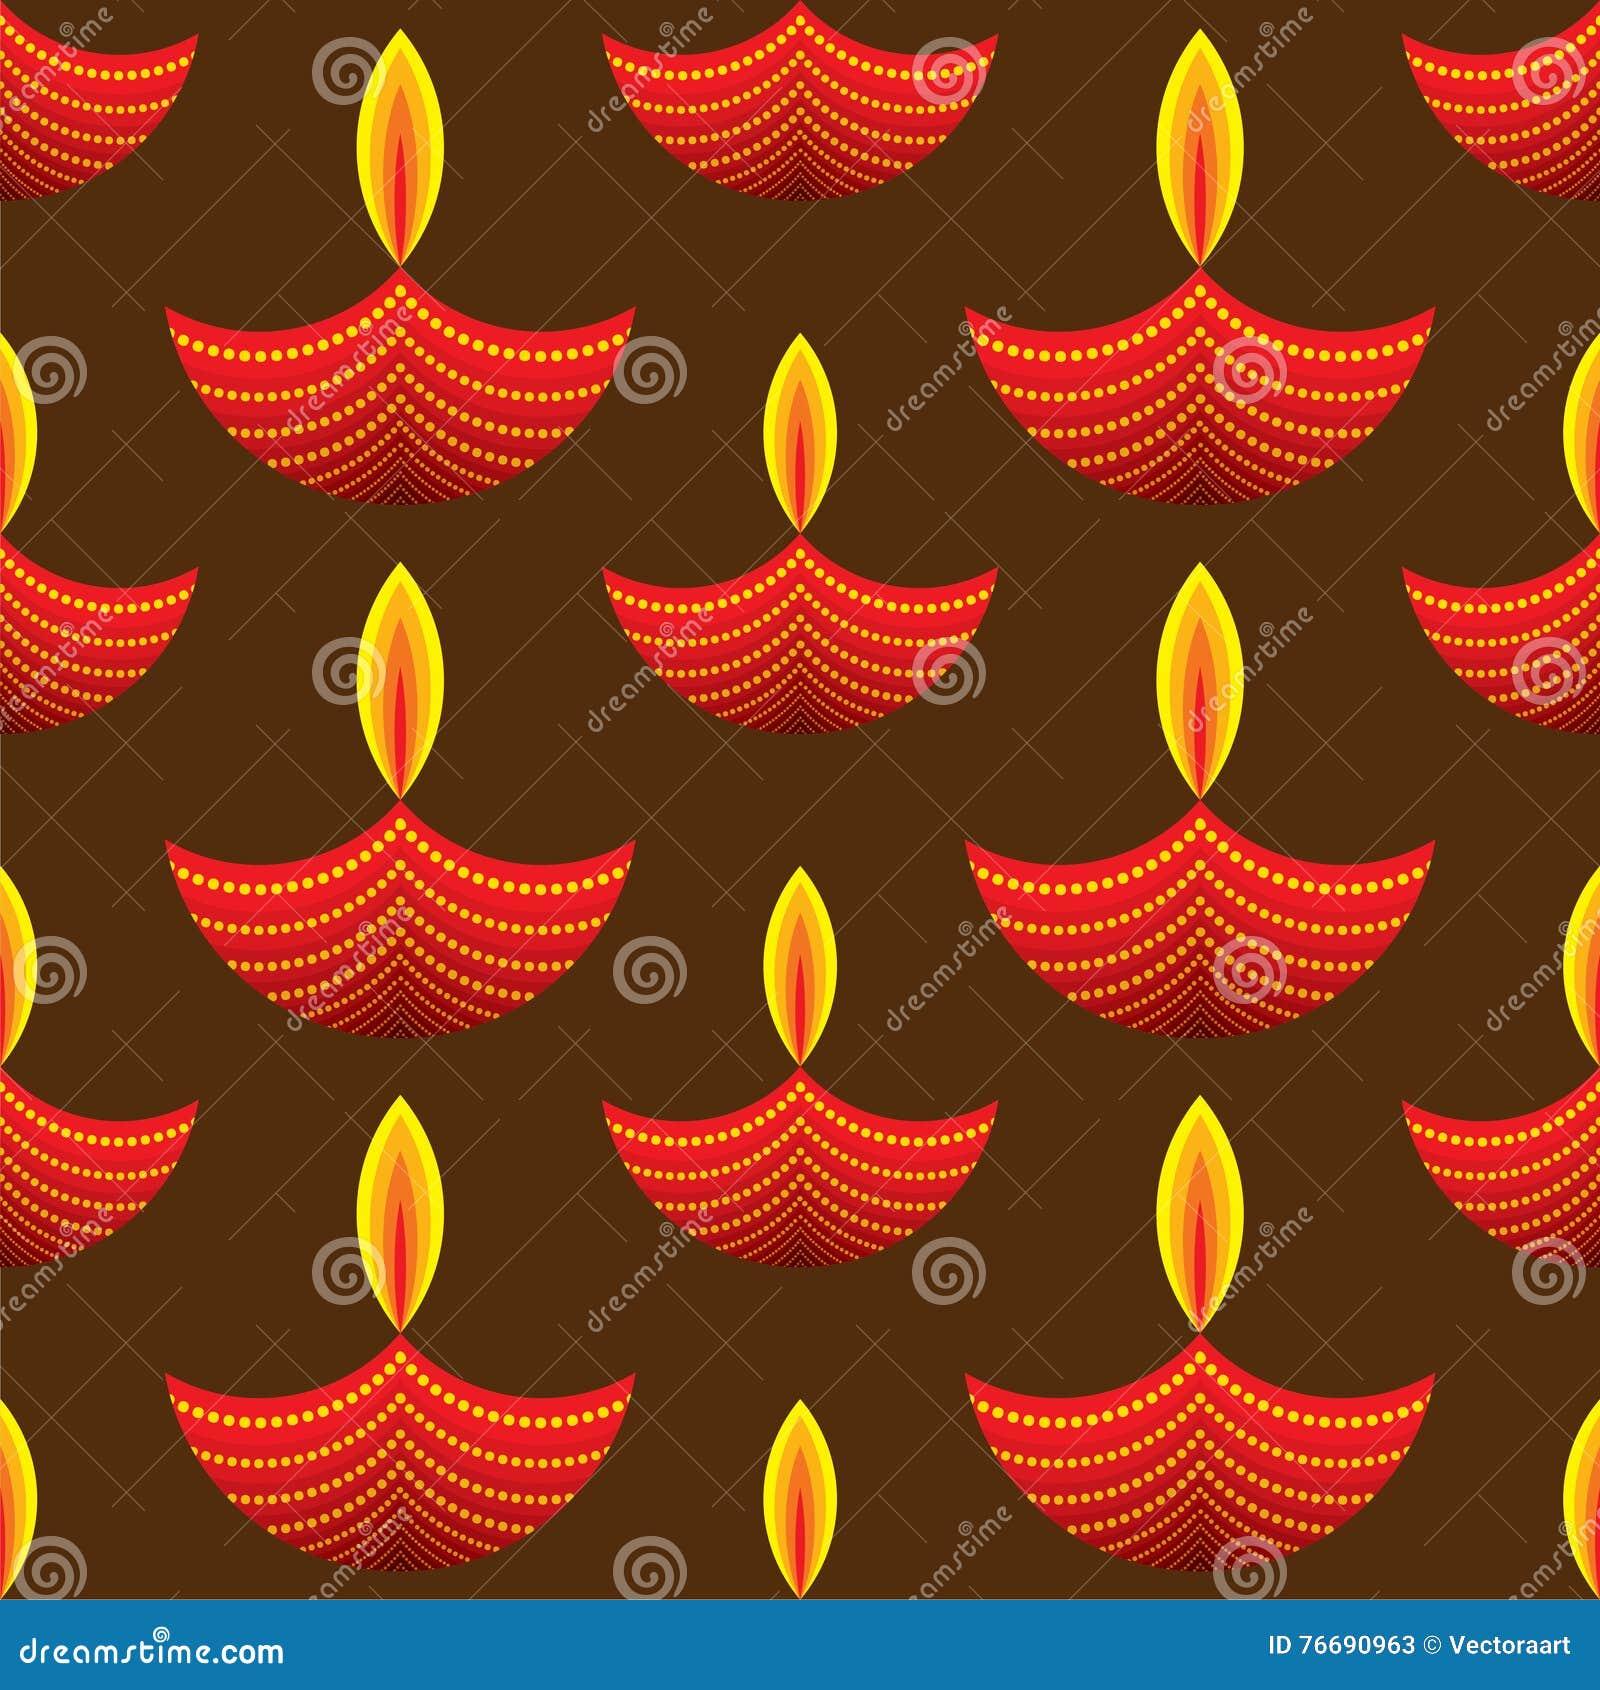 Happy diwali greeting card design stock vector illustration of download happy diwali greeting card design stock vector illustration of colorful indian 76690963 m4hsunfo